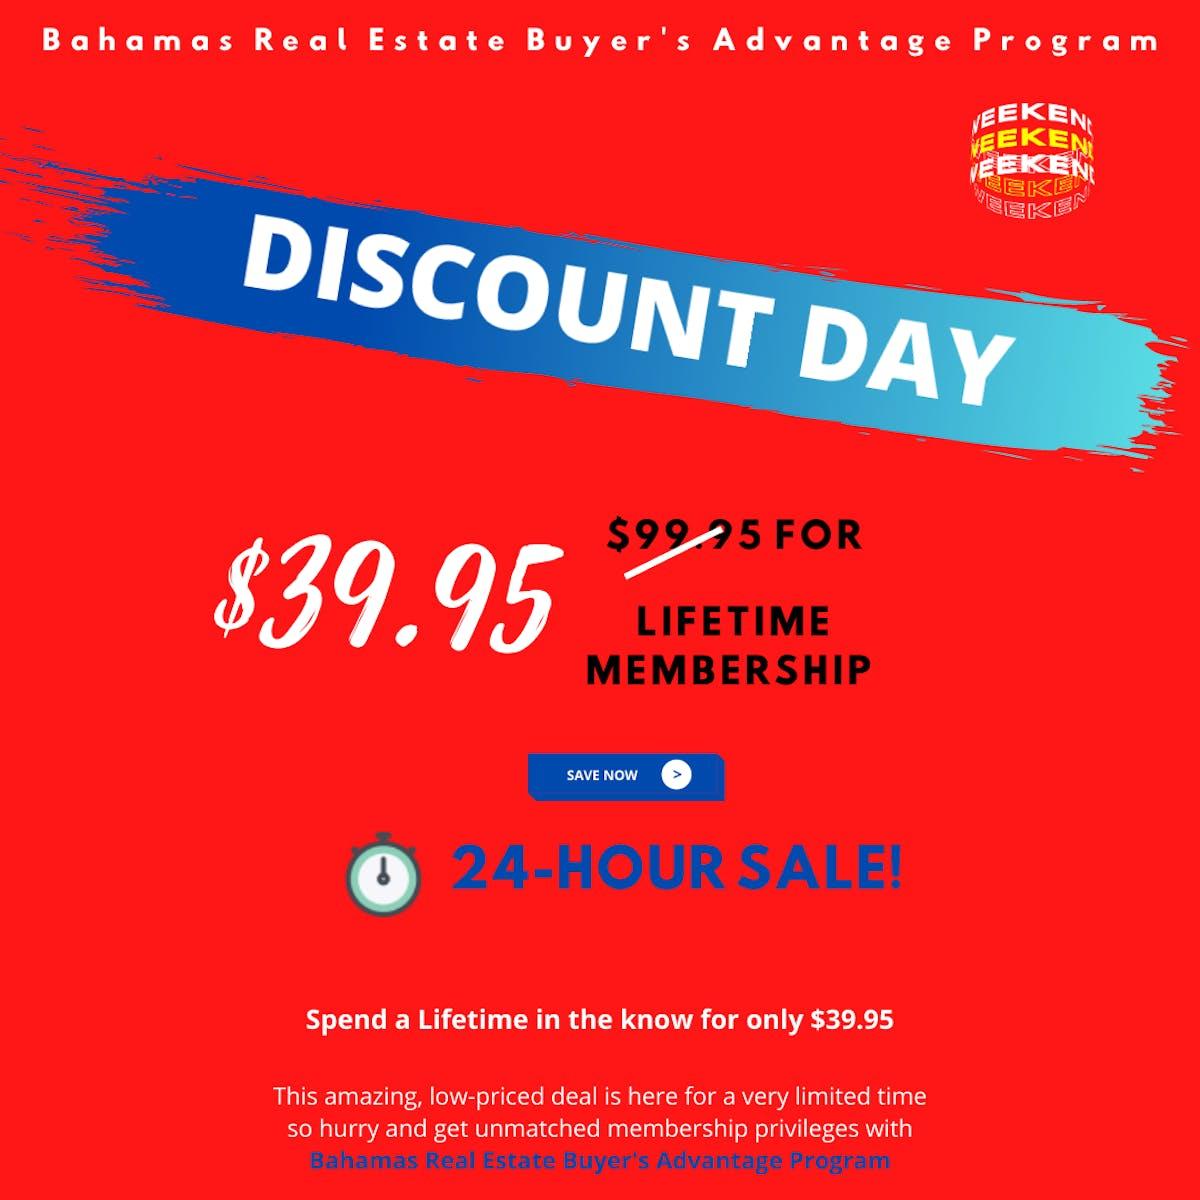 Bahamas Real Estate Buyers Advantage Program Discount  Day